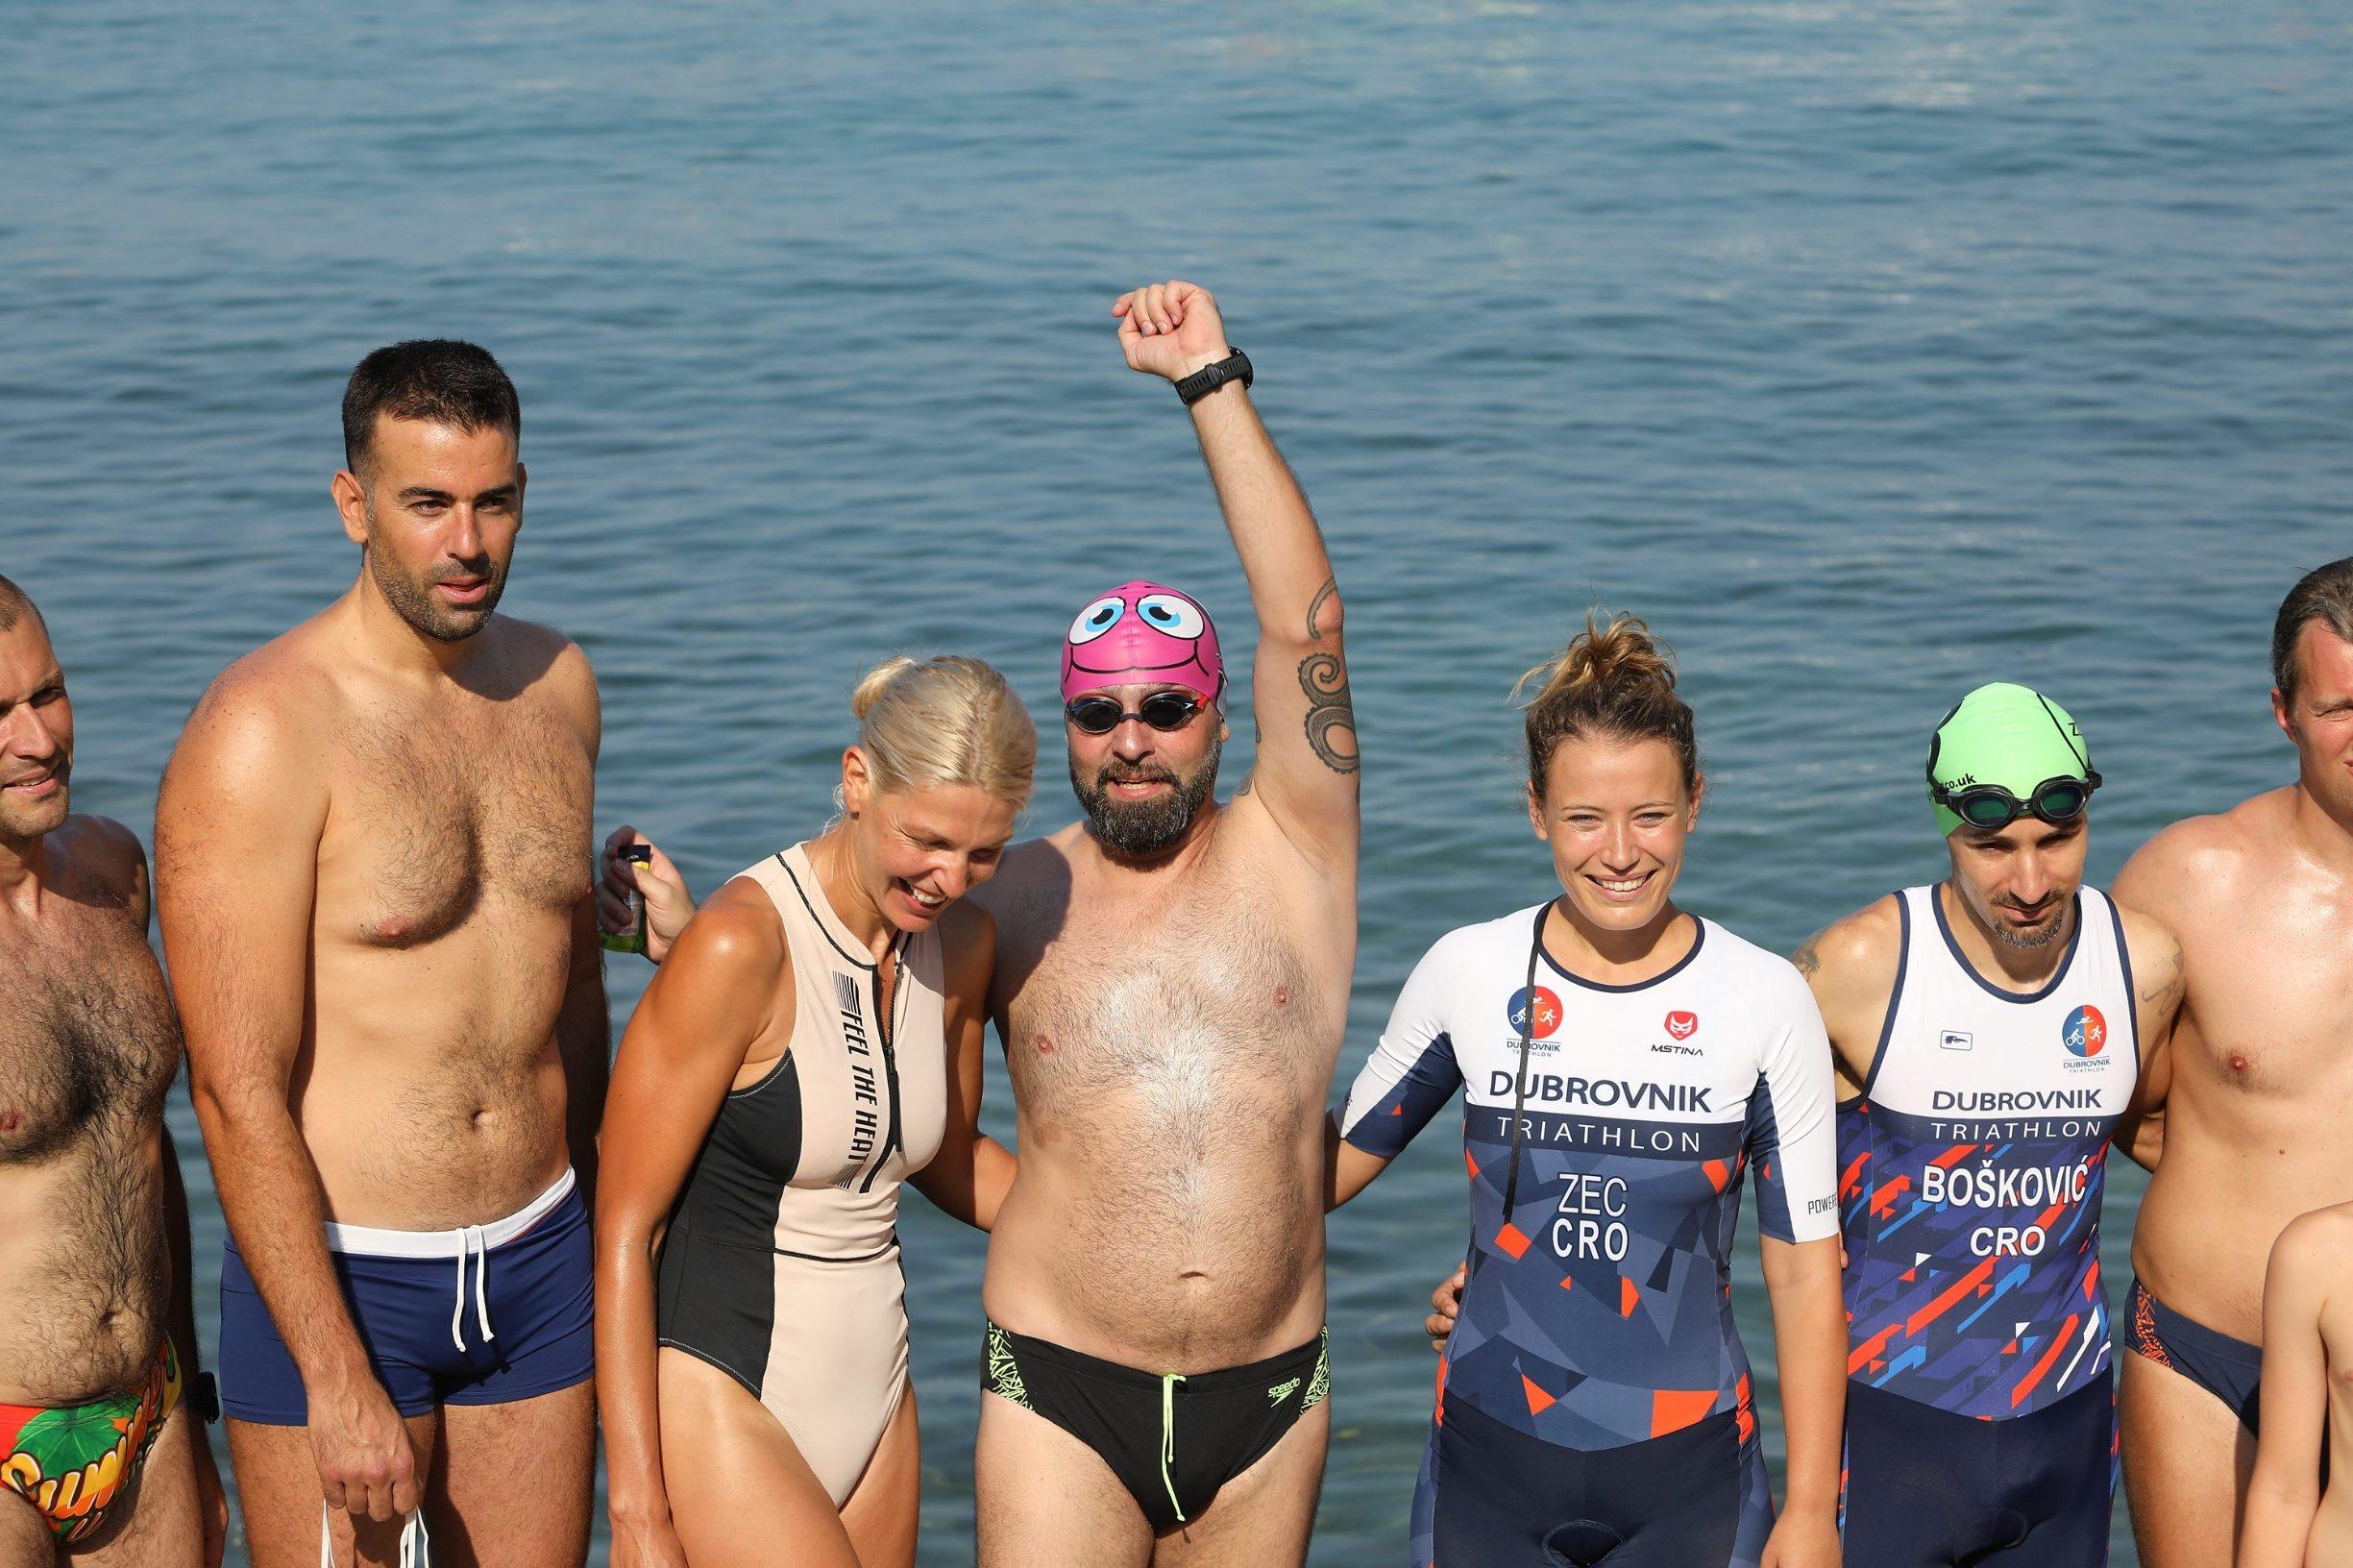 Dubrovnik, 060719. Domagoj Jakopovic Ribafish jutros je s lapadske plaze krenuo u jednomjesecni plivacki maraton RokOtok, u spomen na preminulog sina Roka. Na fotografiji: Domagoj Jakopovic Ribafish  Foto: Bozo Radic / CROPIX